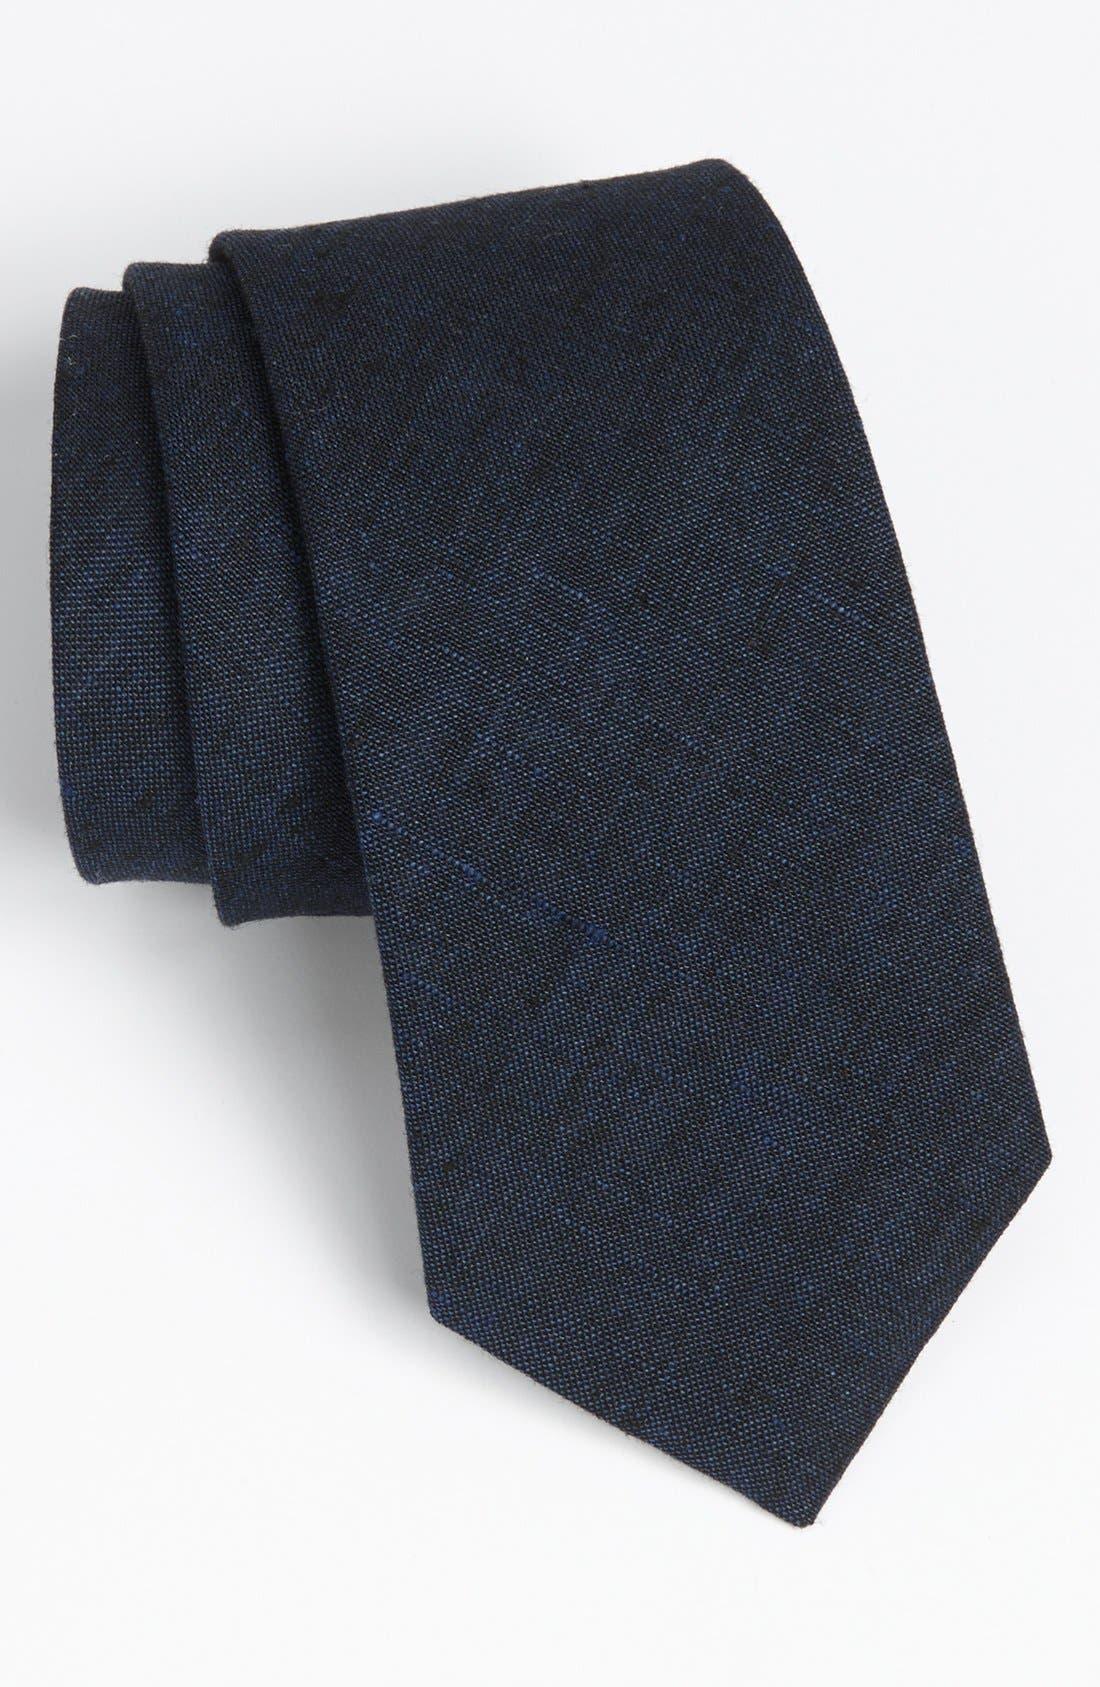 Main Image - Robert Stewart Woven Tie